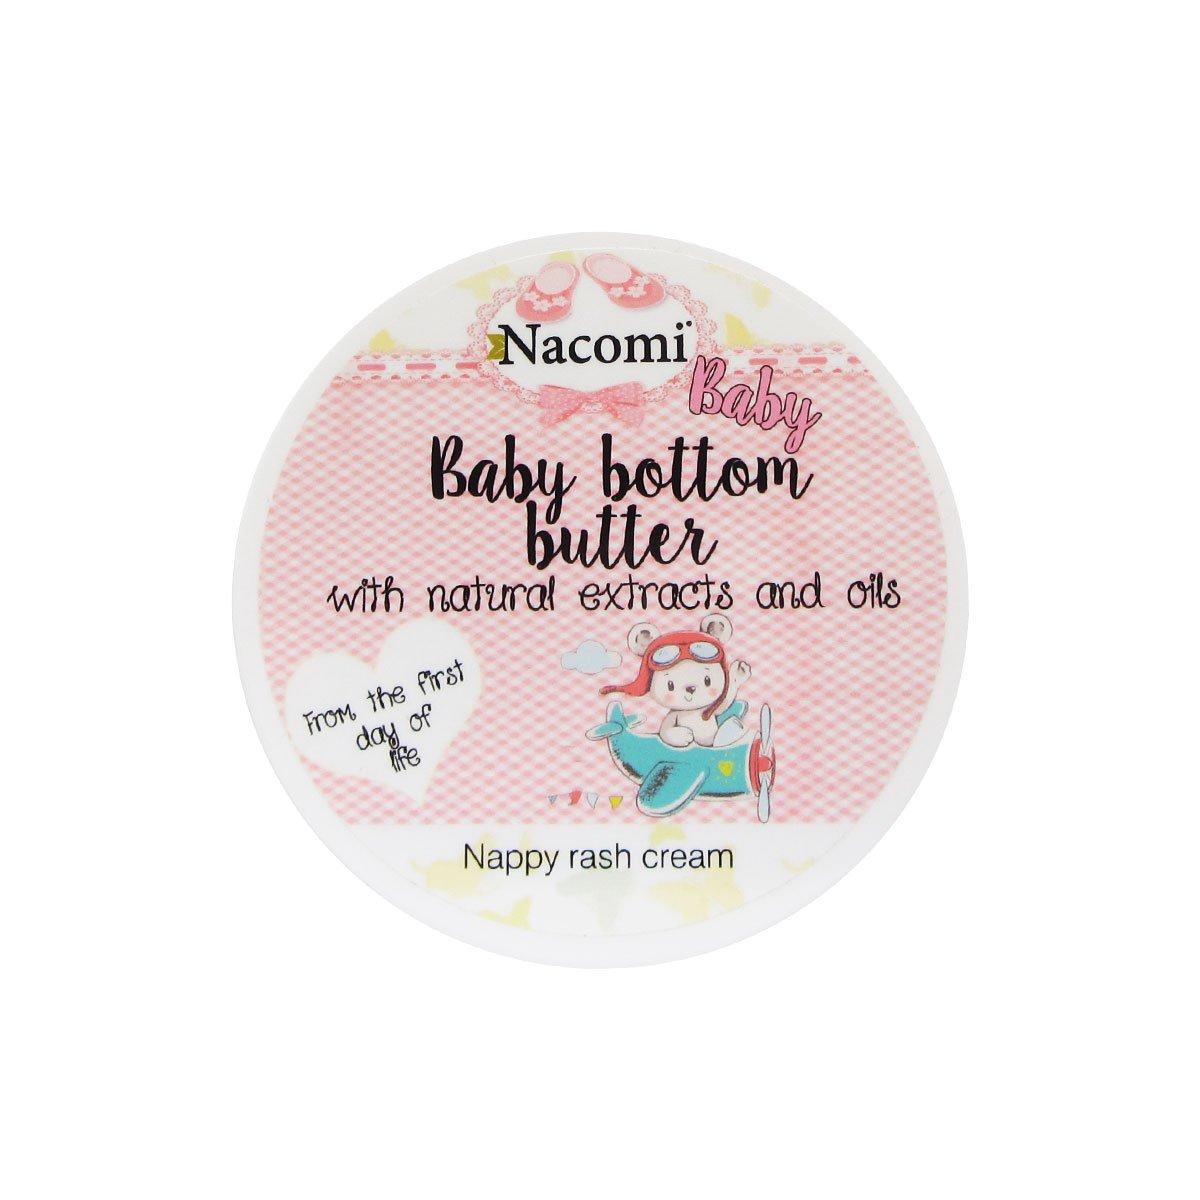 Nacomi Natural Baby Bottom Butter 3.5oz